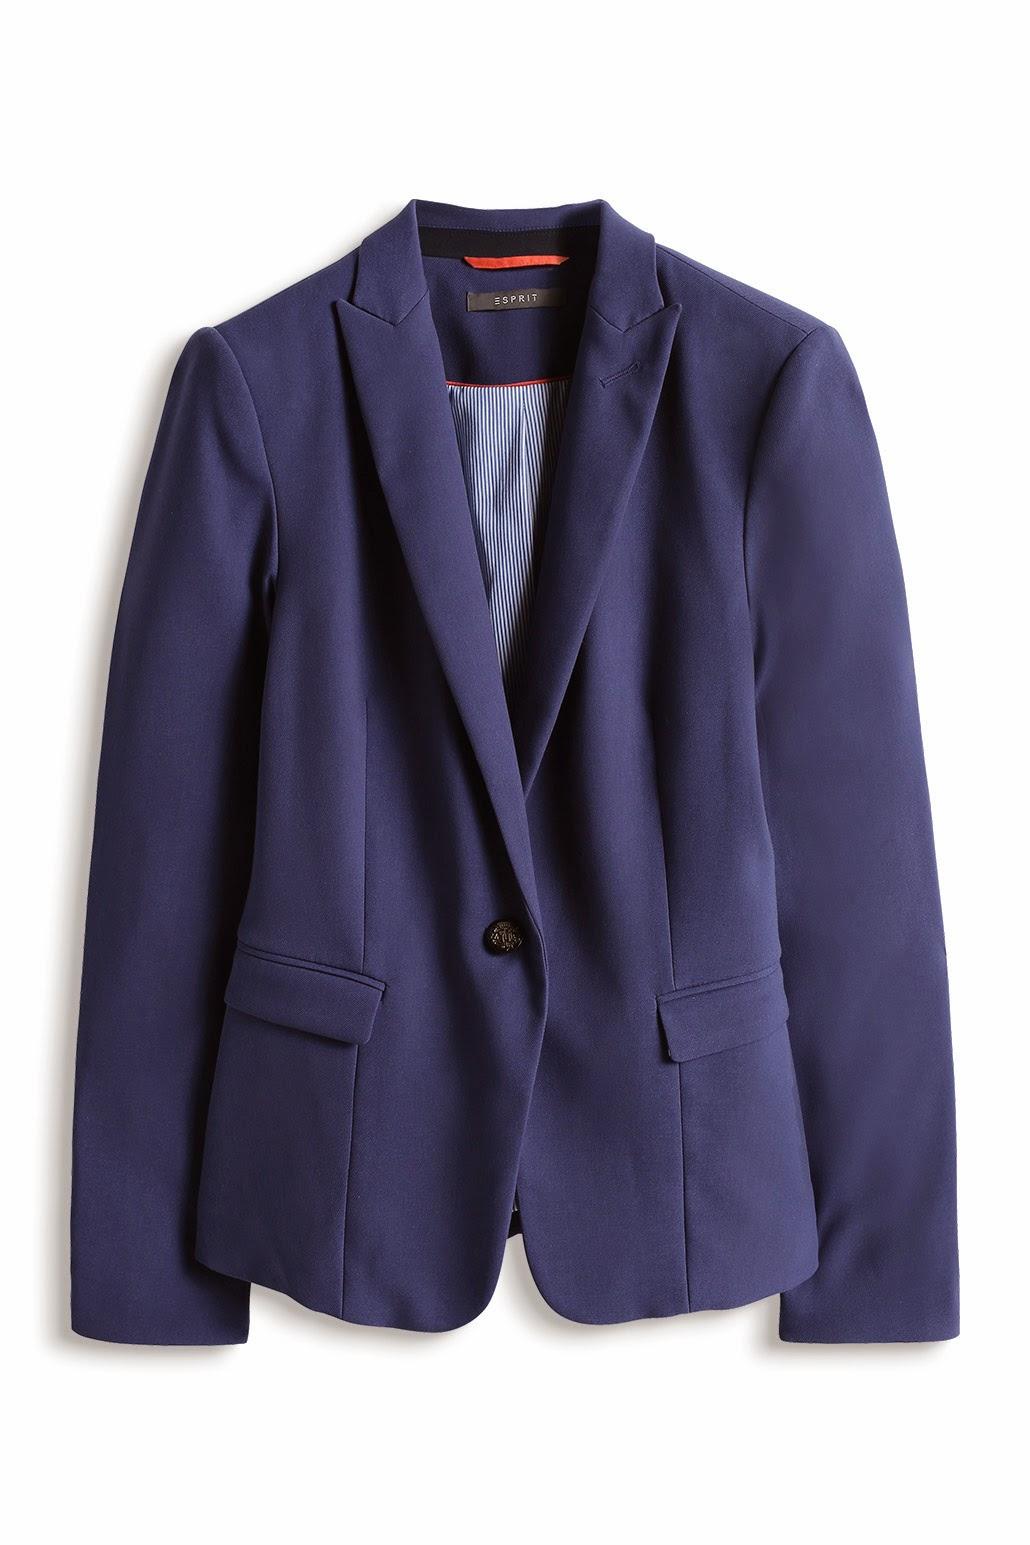 http://www.esprit.fr/femmes-blazers-tailleurs/doux-blazer-en-twill-boutons-armoiries-025EO1G022_515